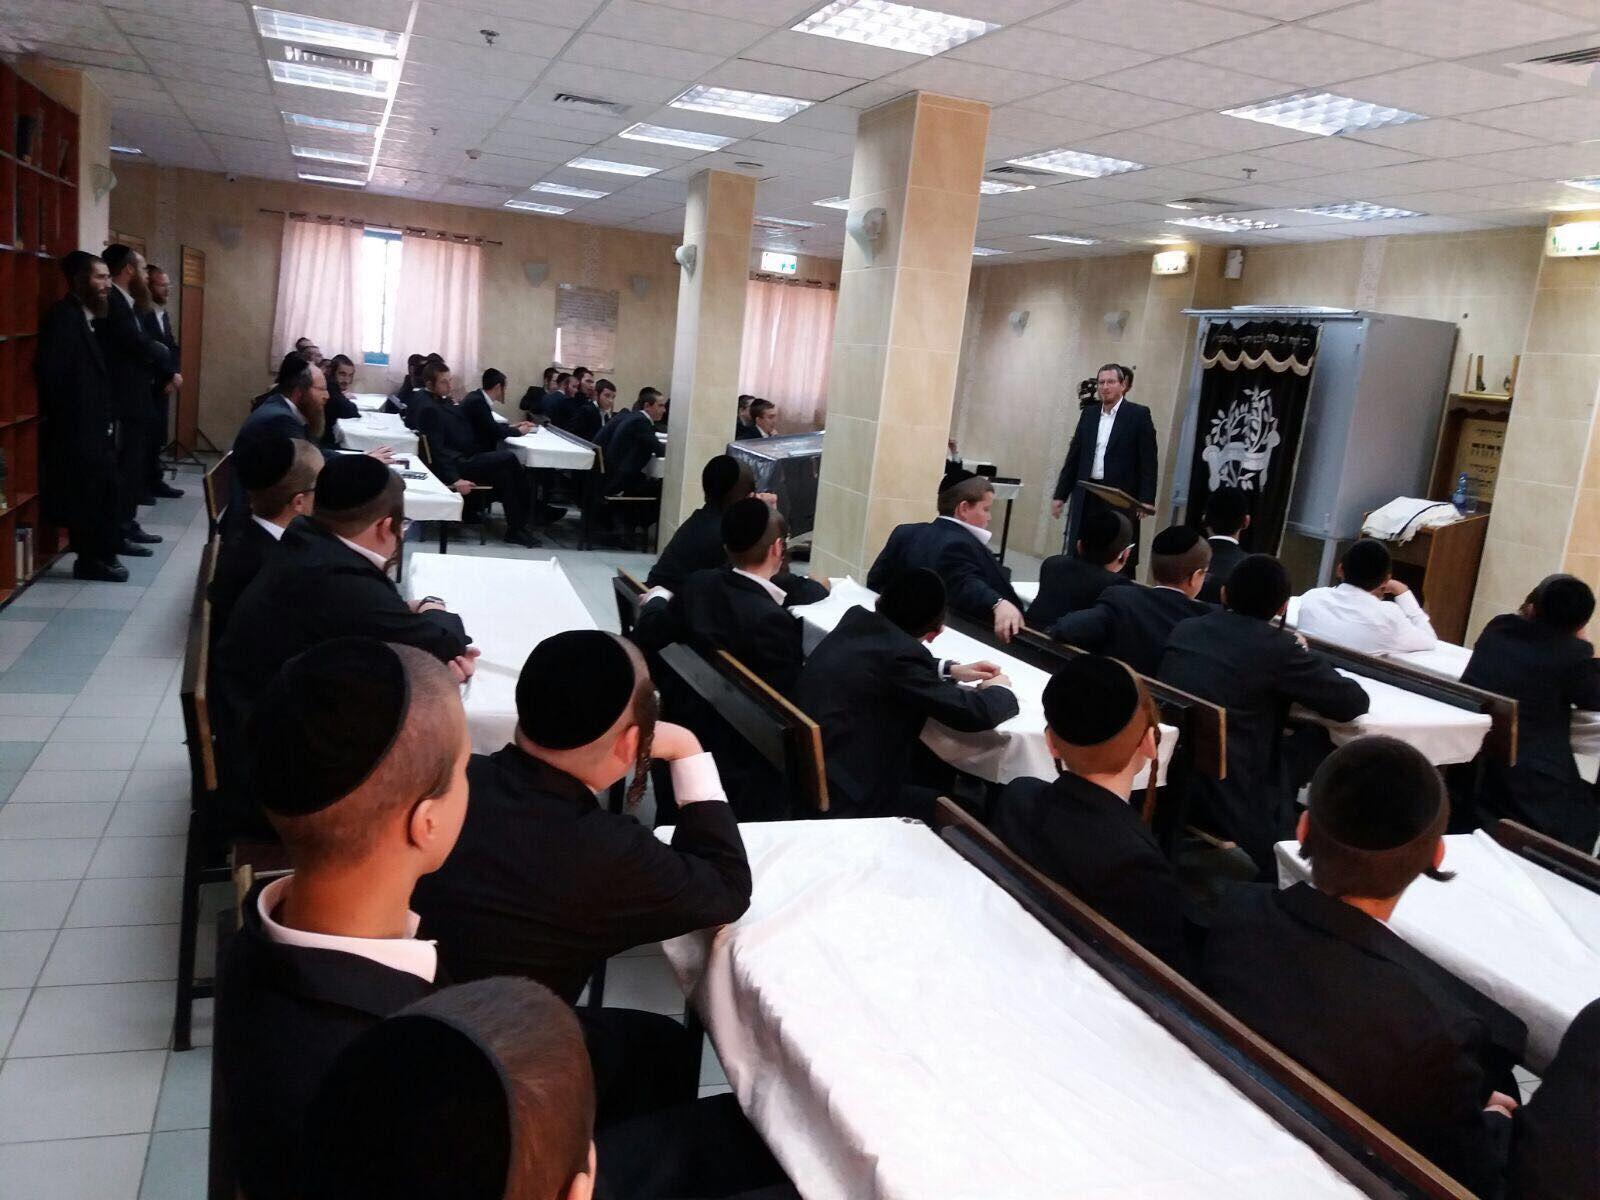 Menachem Bombach teaches students in his Midrasha Hahasidit in Beitar Ilit.